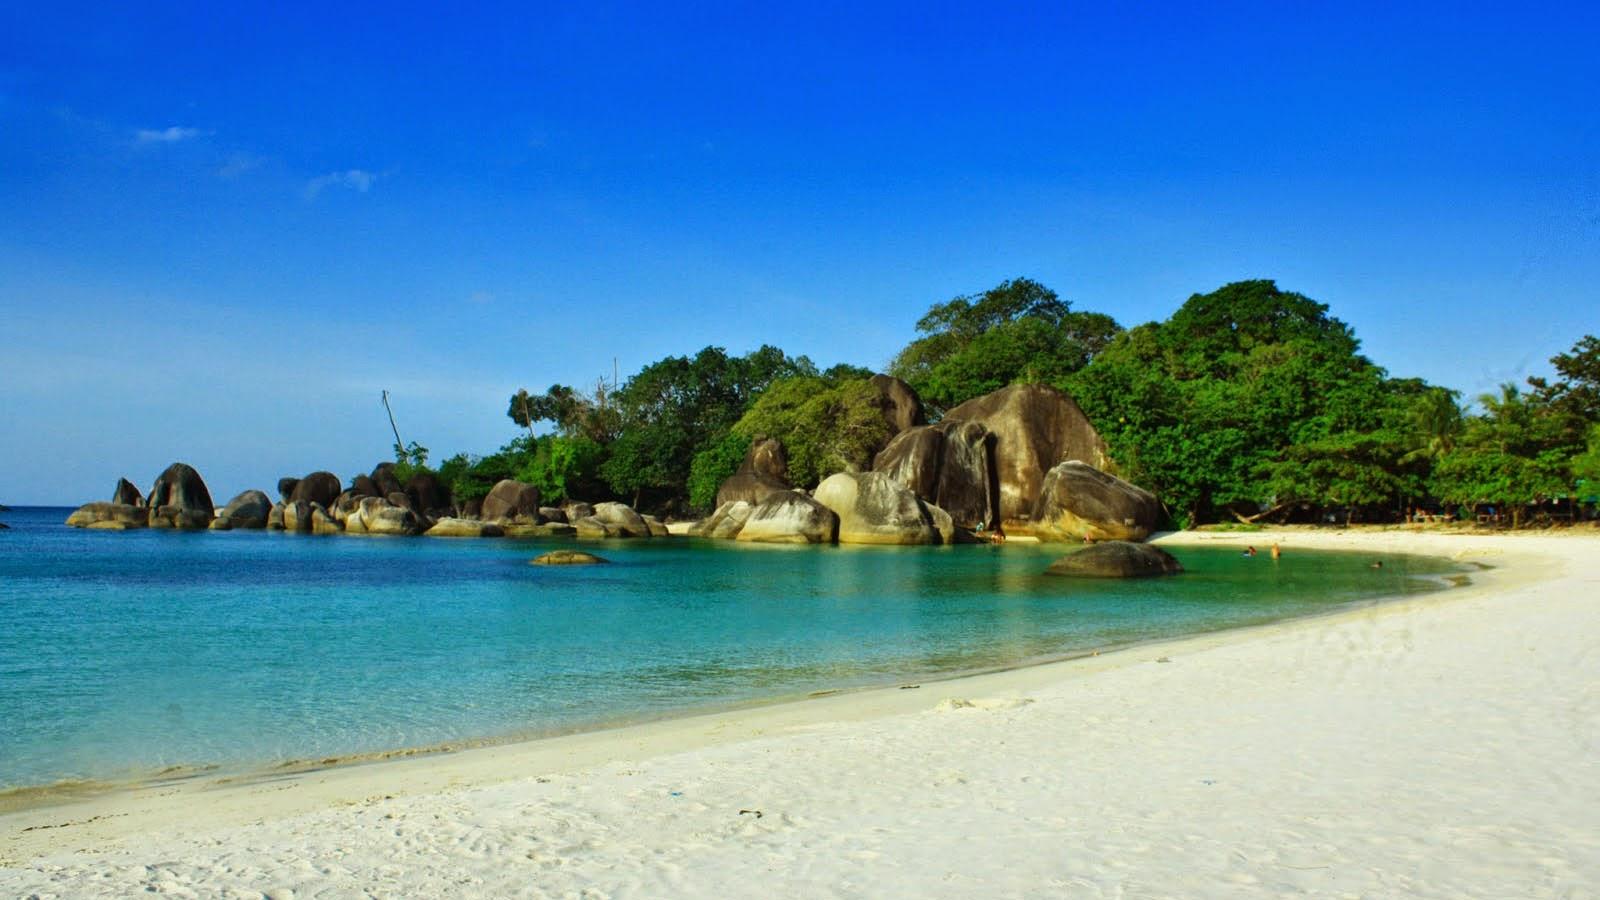 tanjung tinggi pantai laskar pelangi belitung